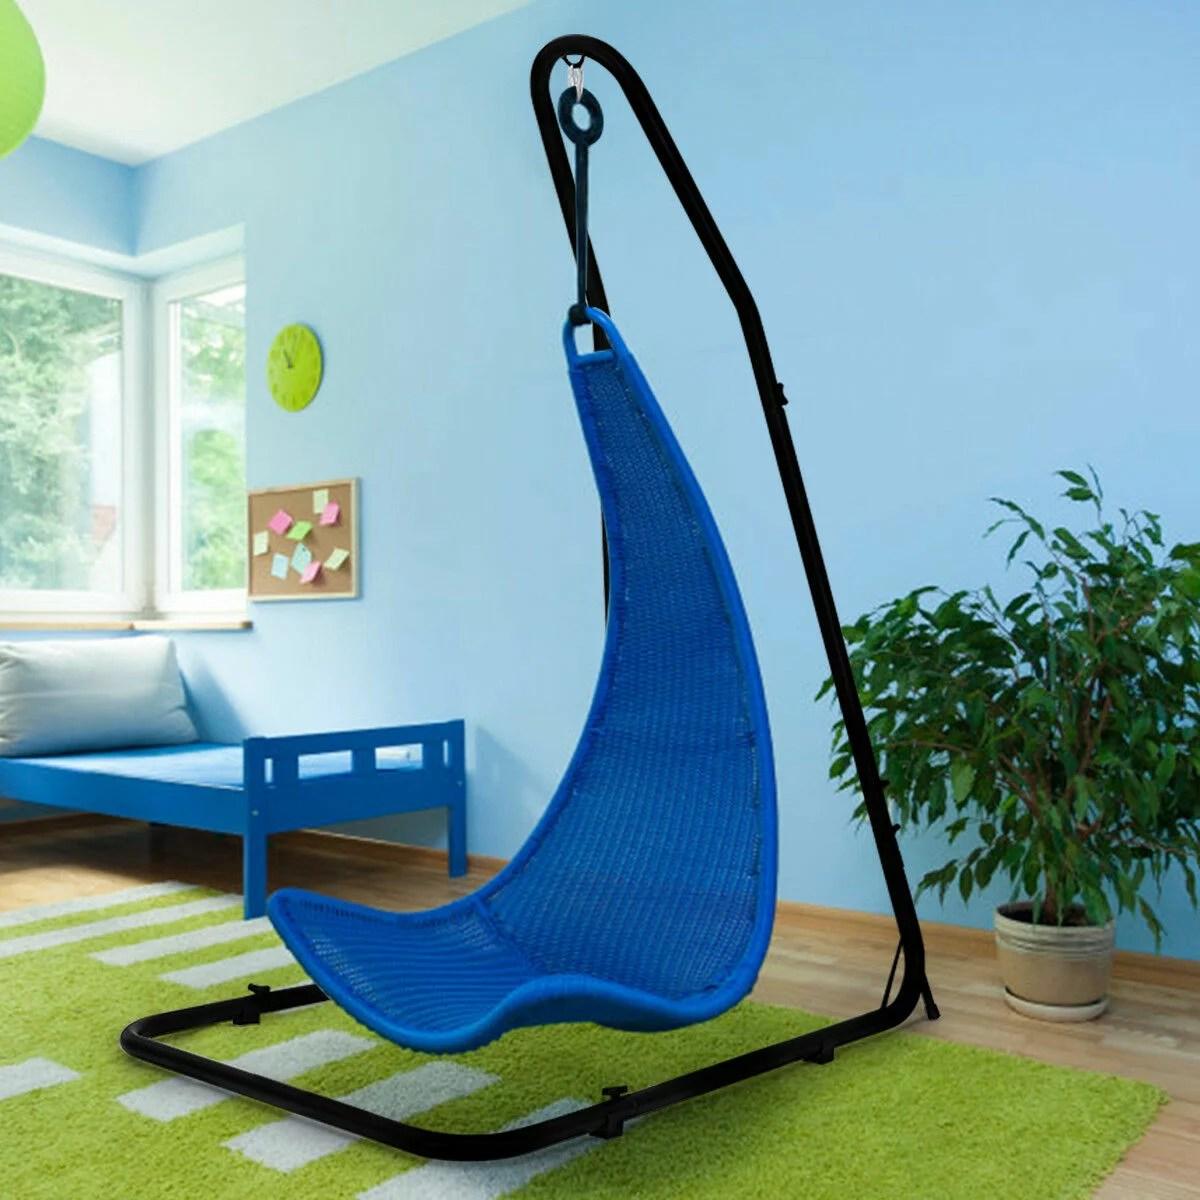 hammock chair stand adjustable 2017 lexus gx captains chairs costway for hammocks swings hanging steel frame 4